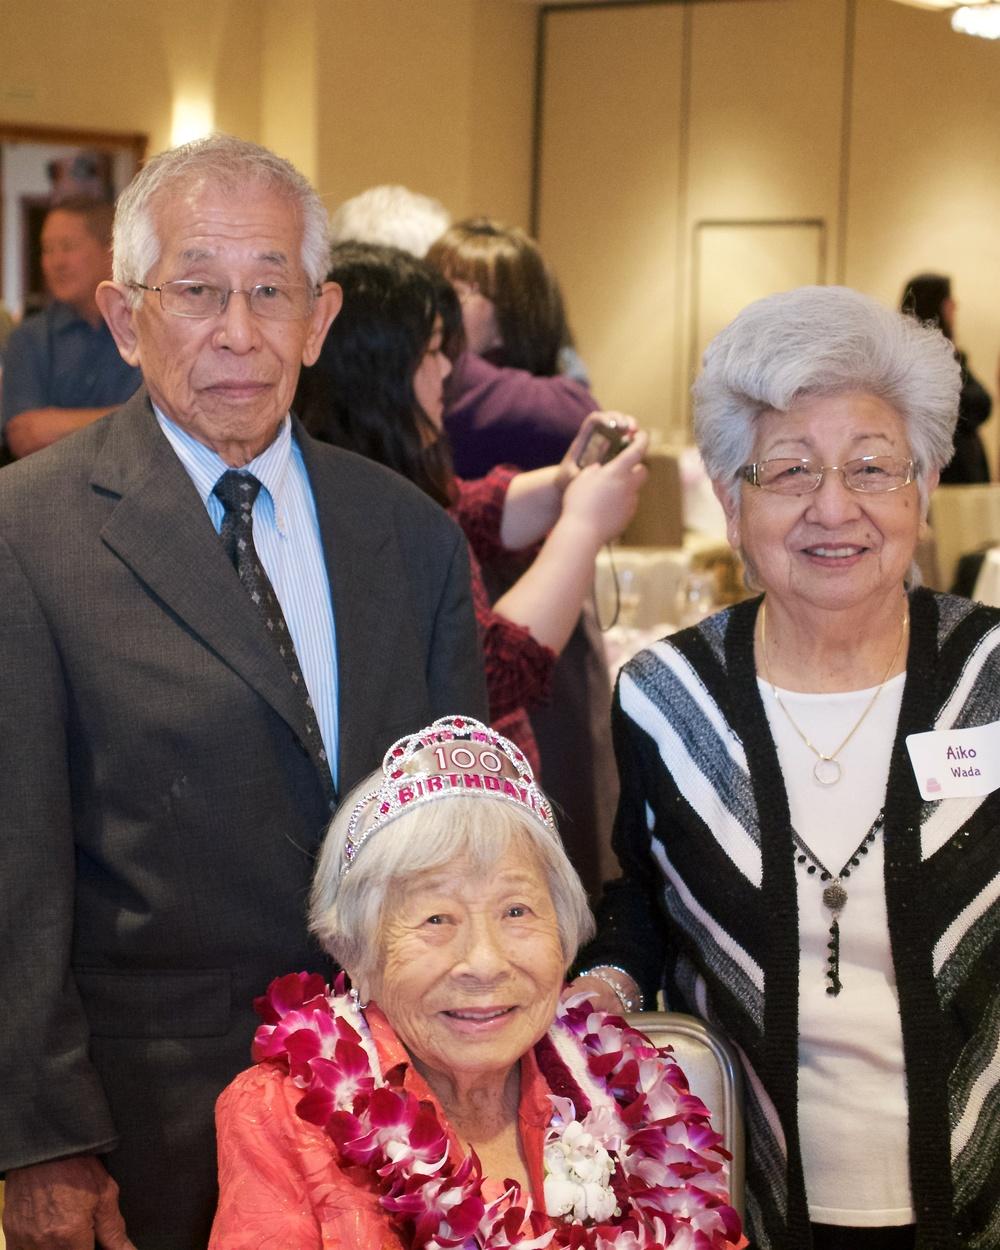 Siblings: my dad, Aunt Haru, Aunt Aiko.